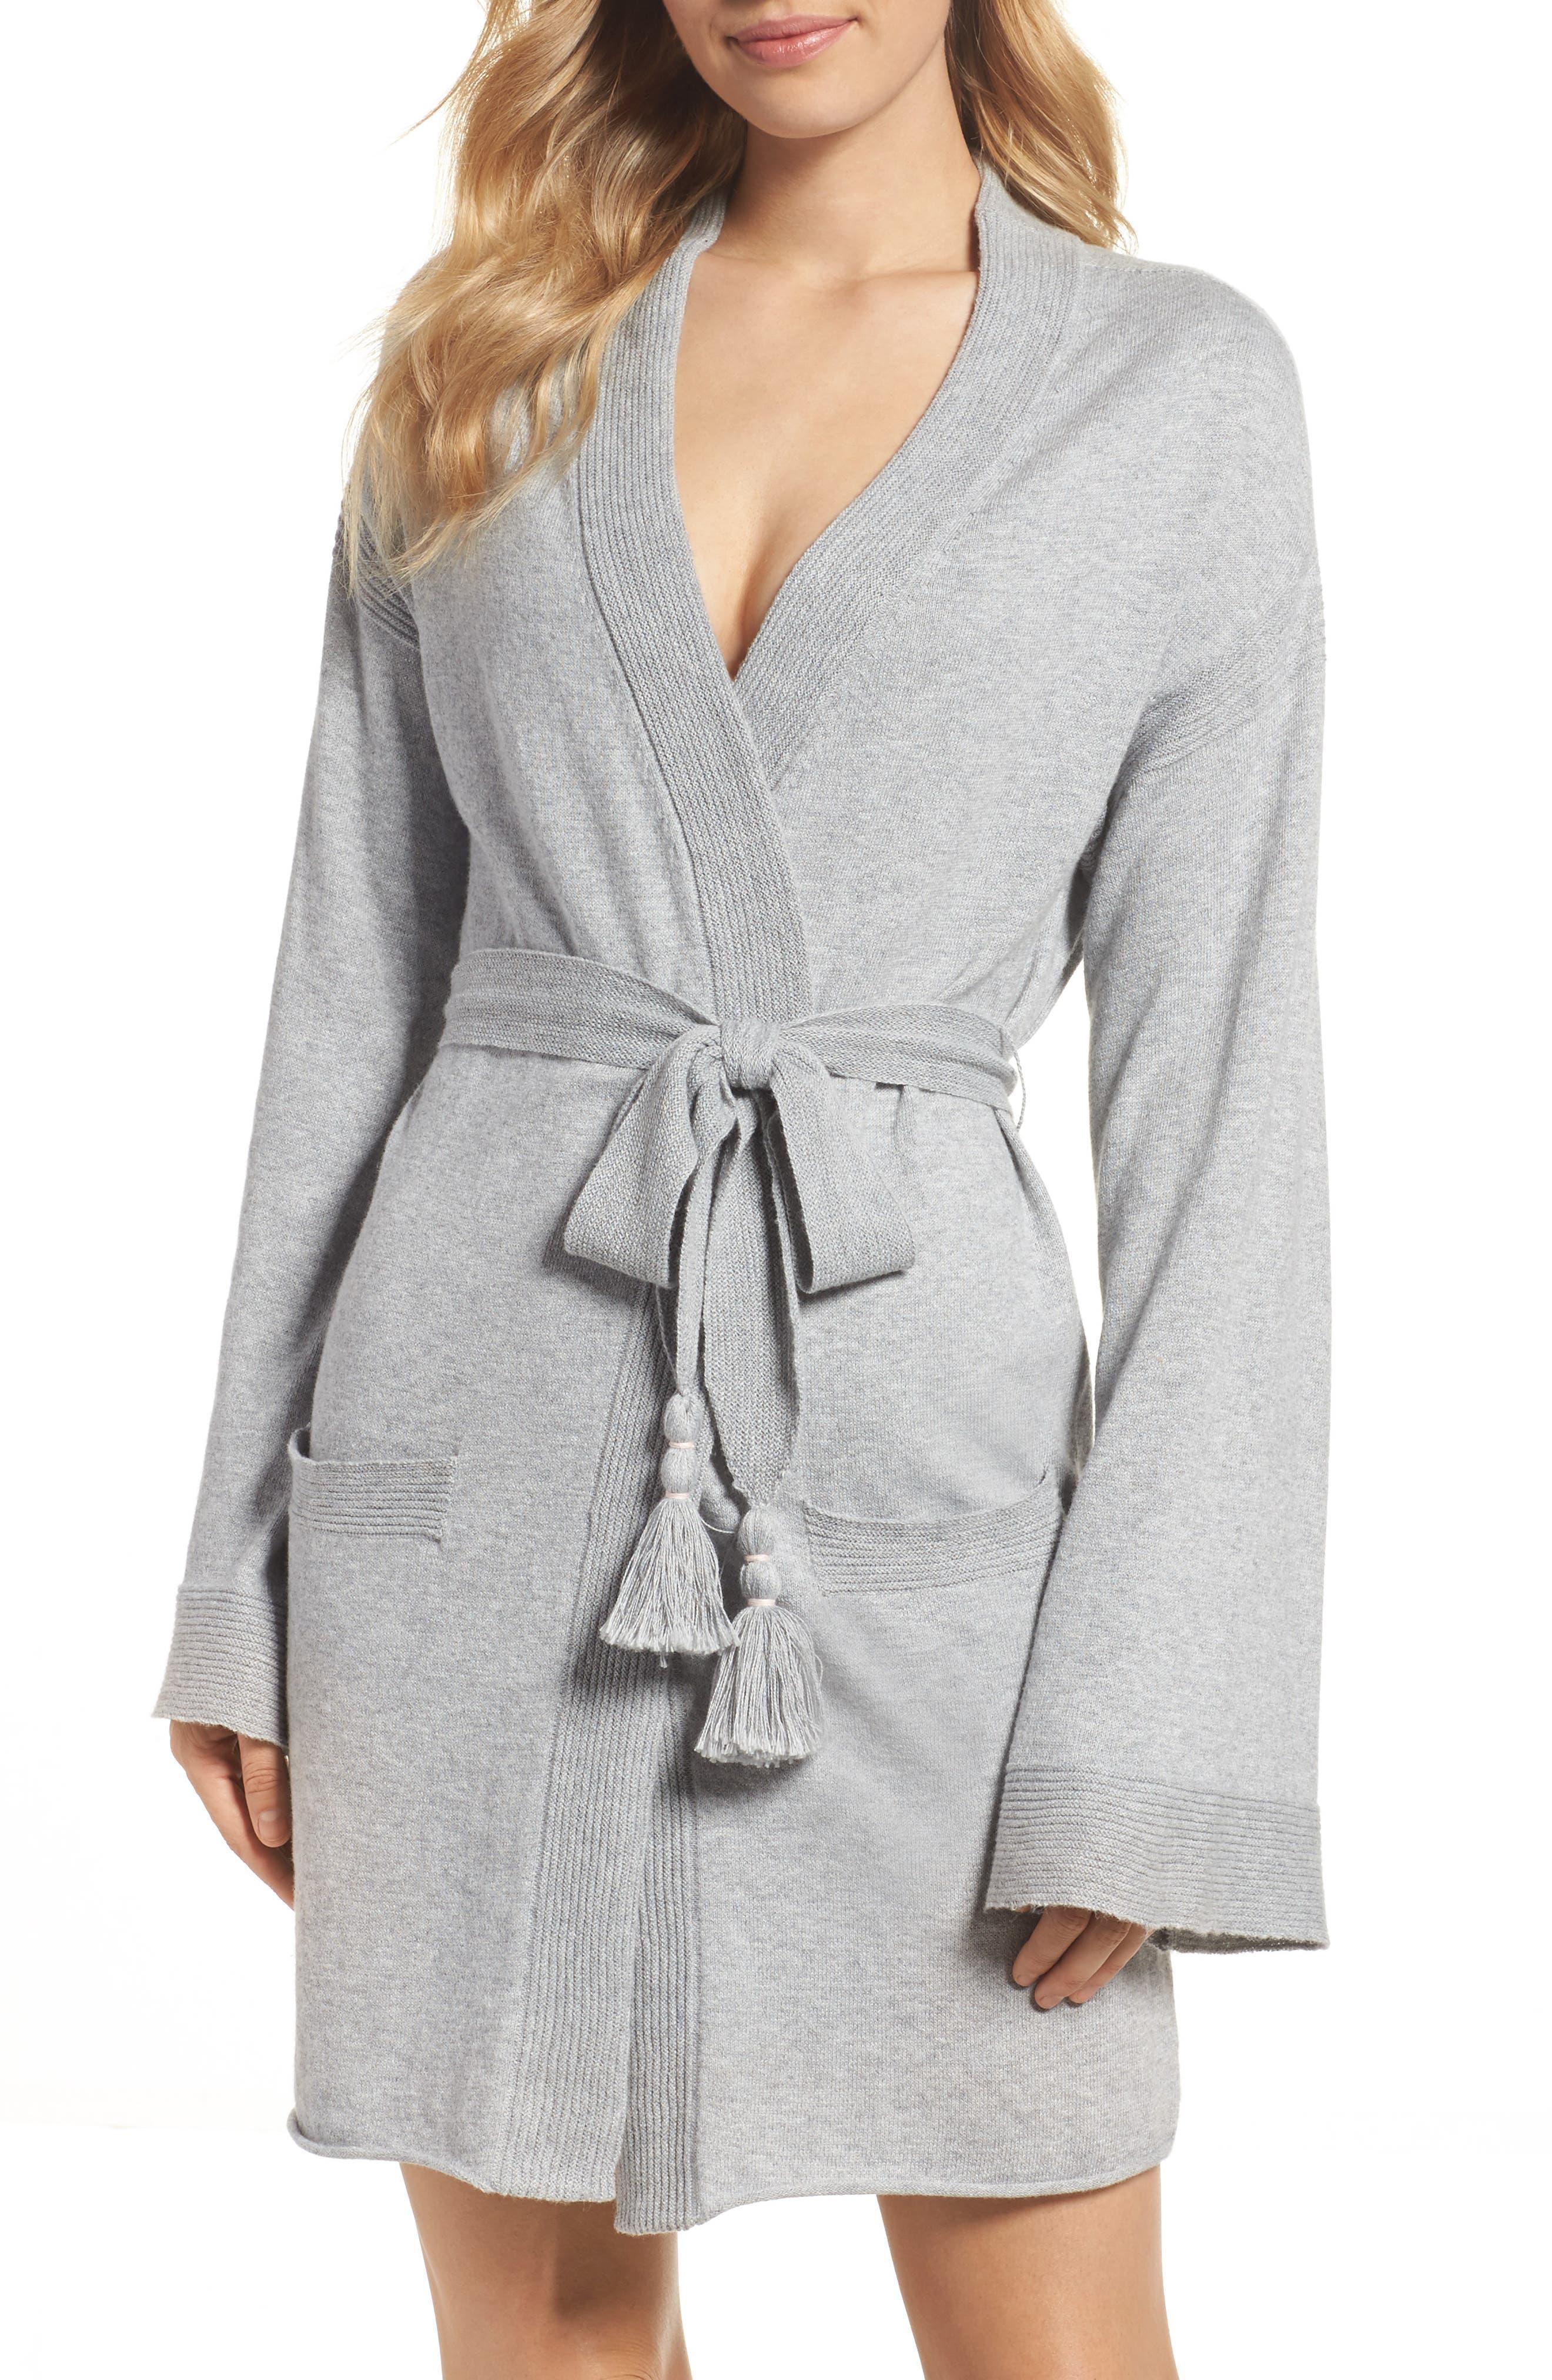 Valoria Short Robe,                             Main thumbnail 1, color,                             020